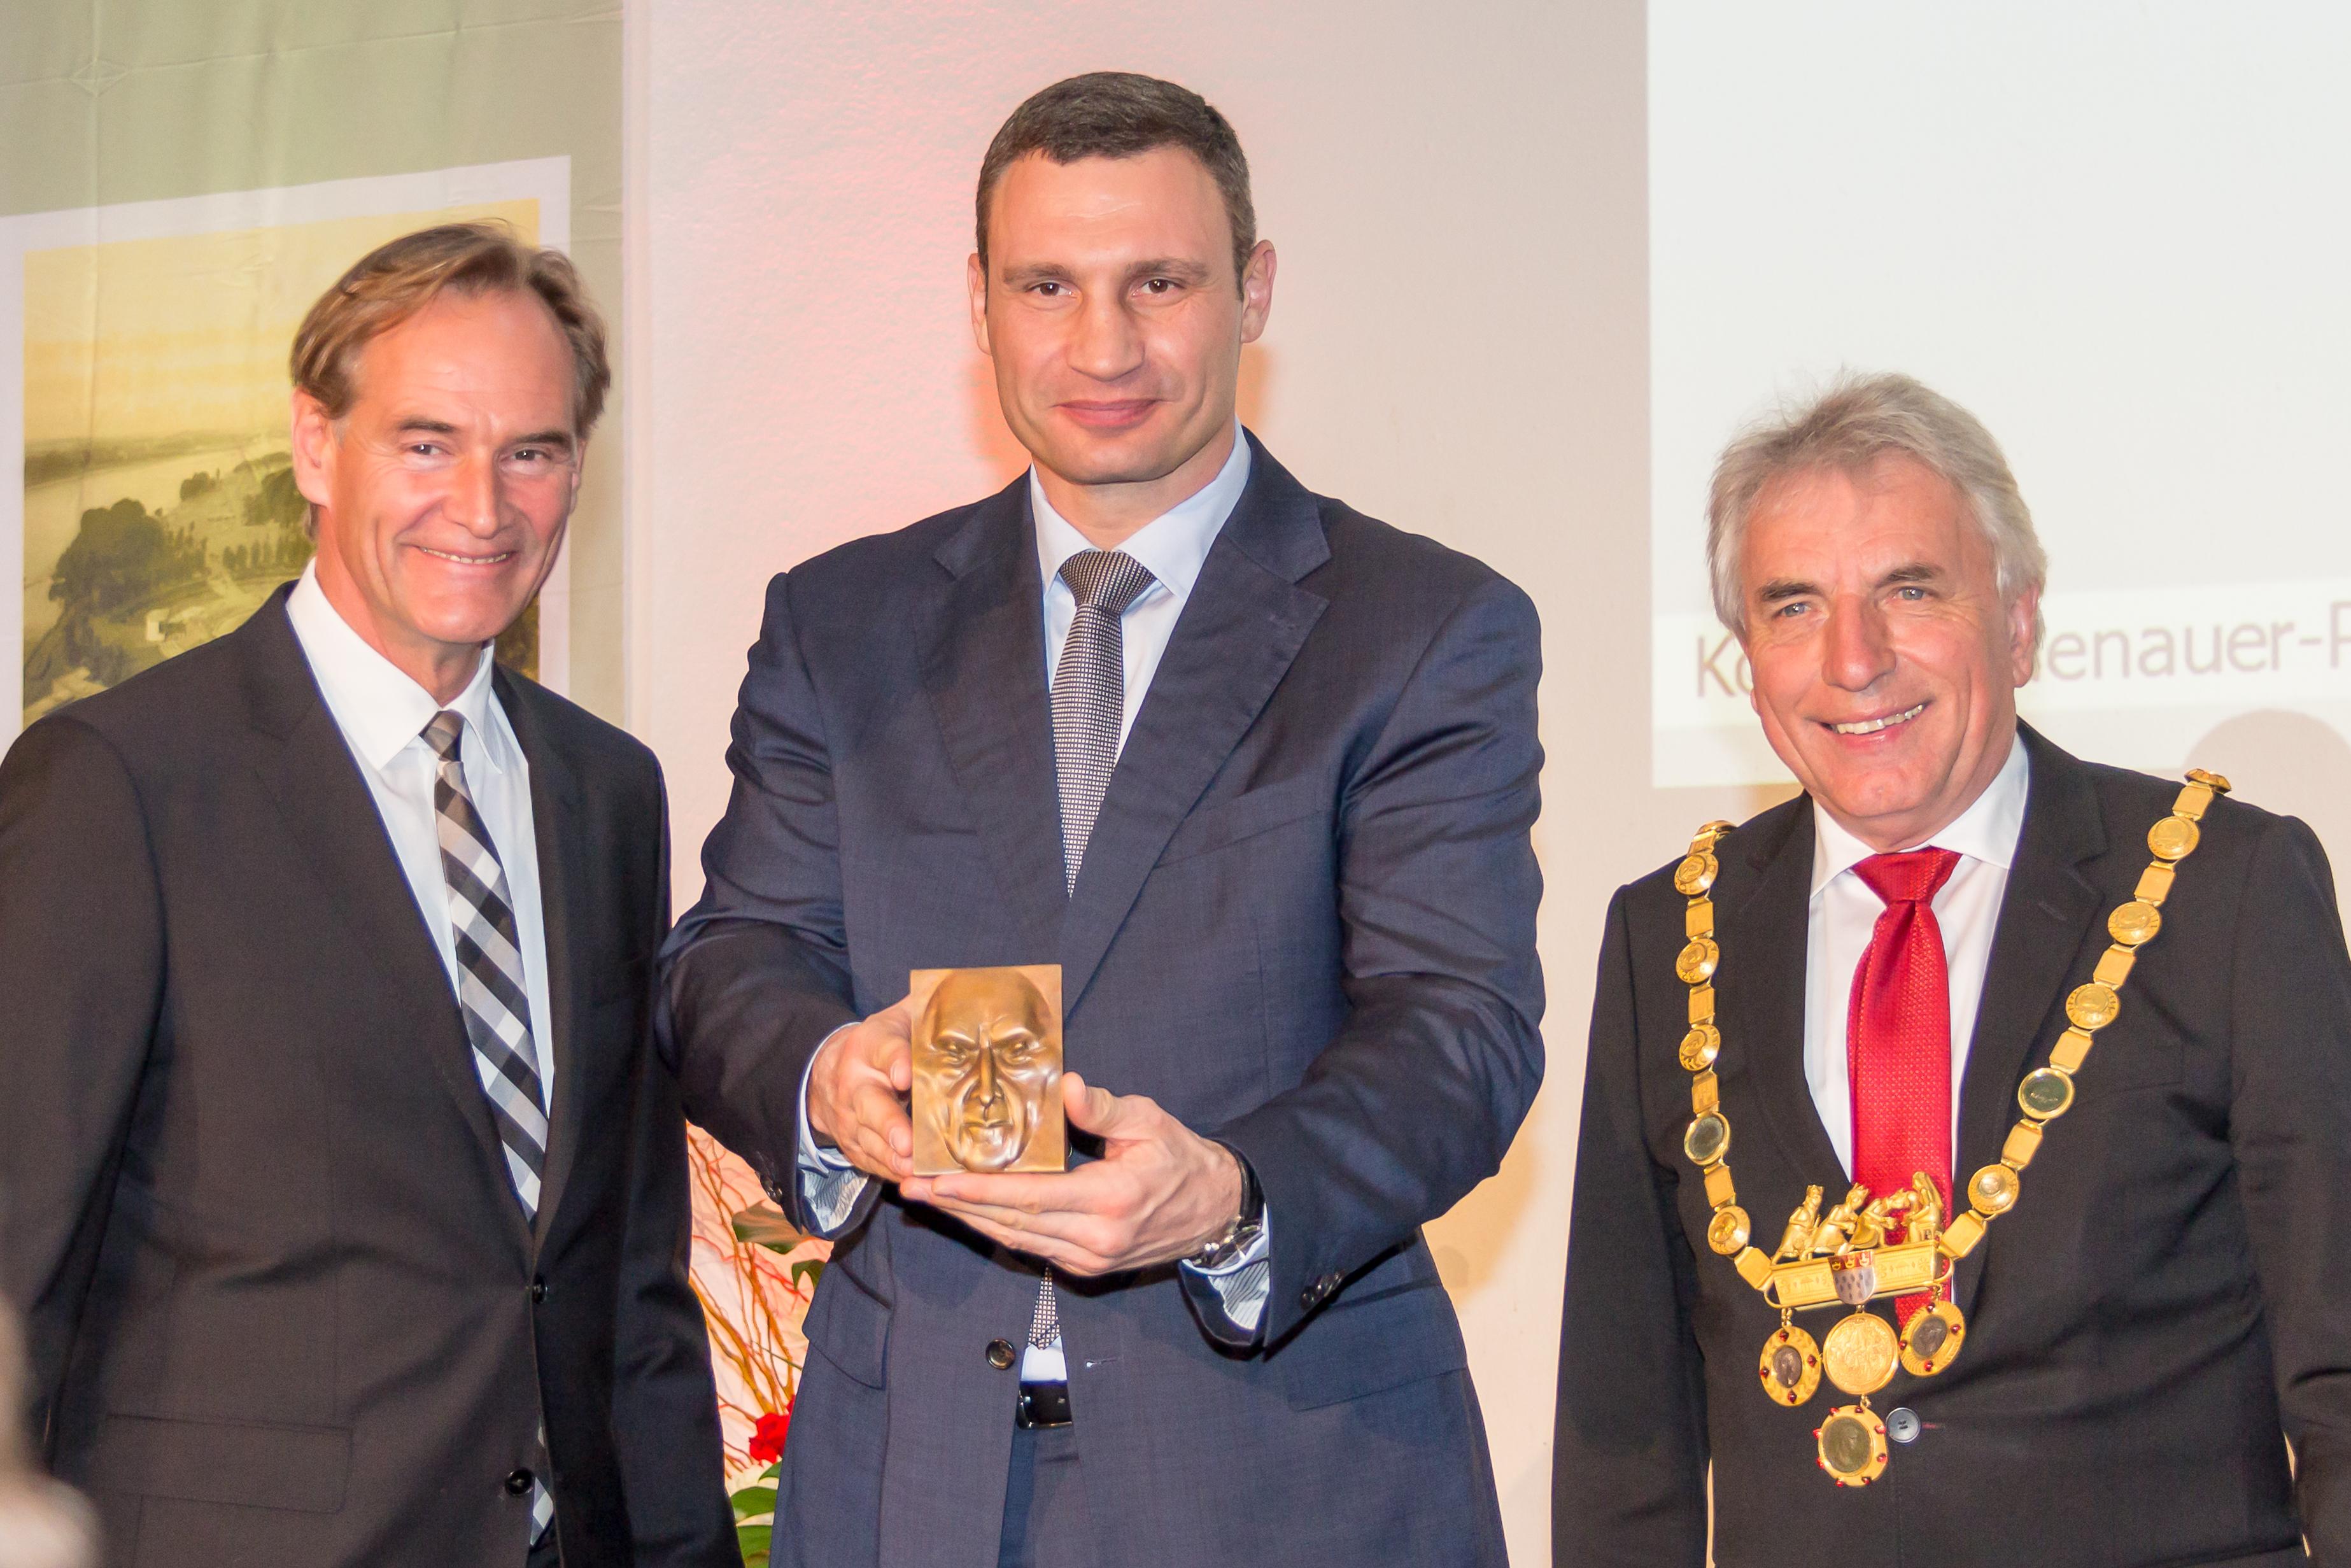 File:Verleihung Konrad-Adenauer-Preis der Stadt Köln 2015 an